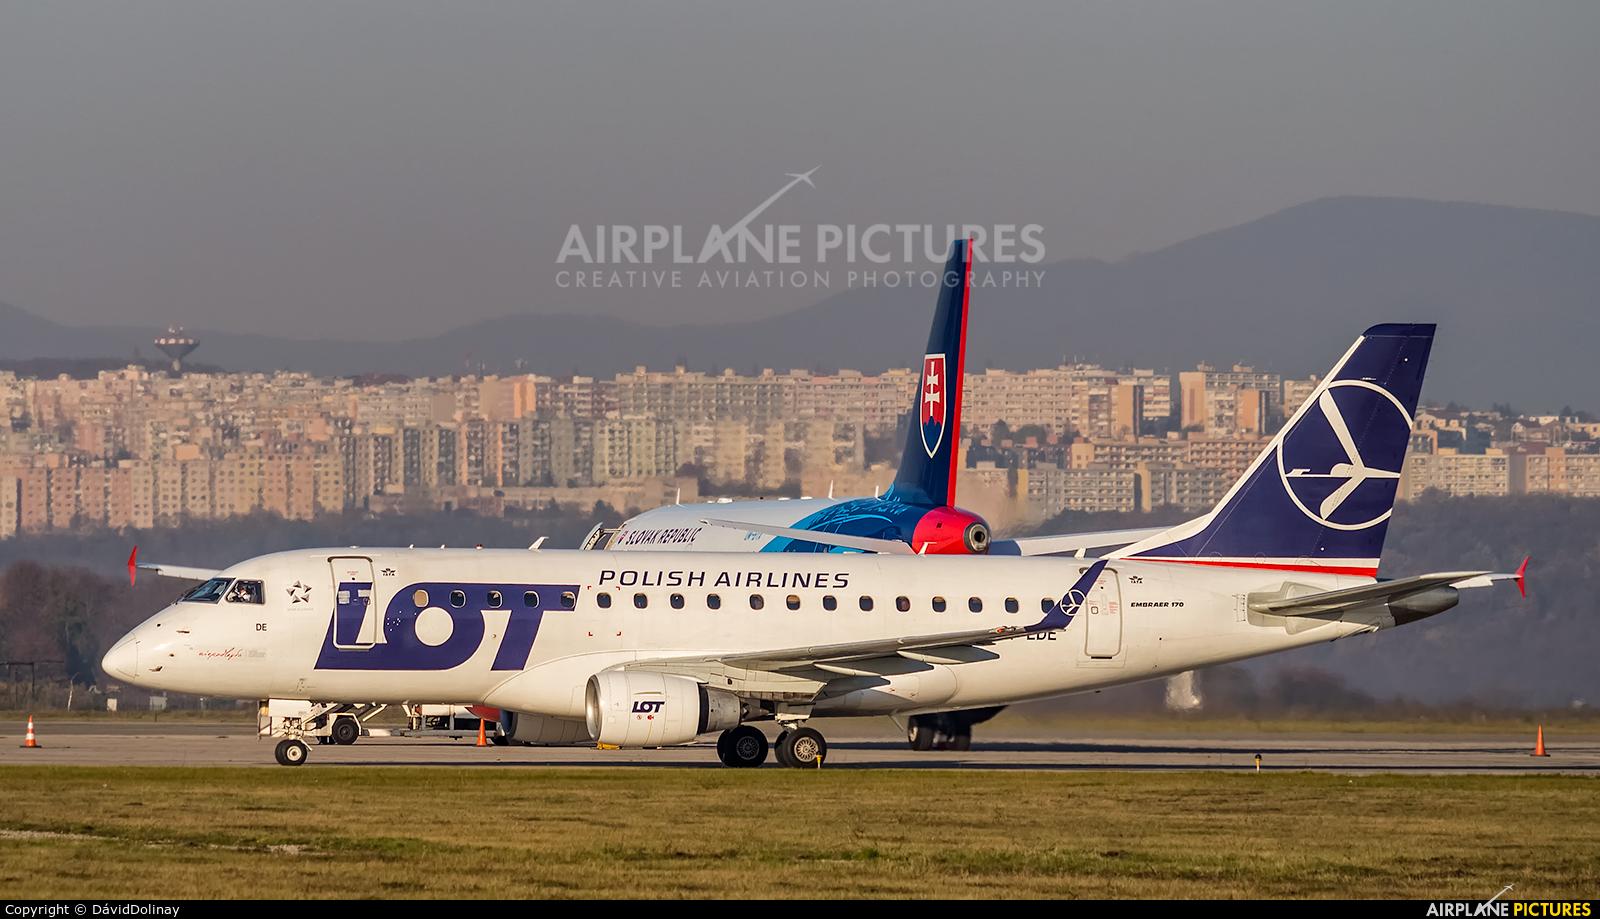 LOT - Polish Airlines SP-LDE aircraft at Košice - Barca